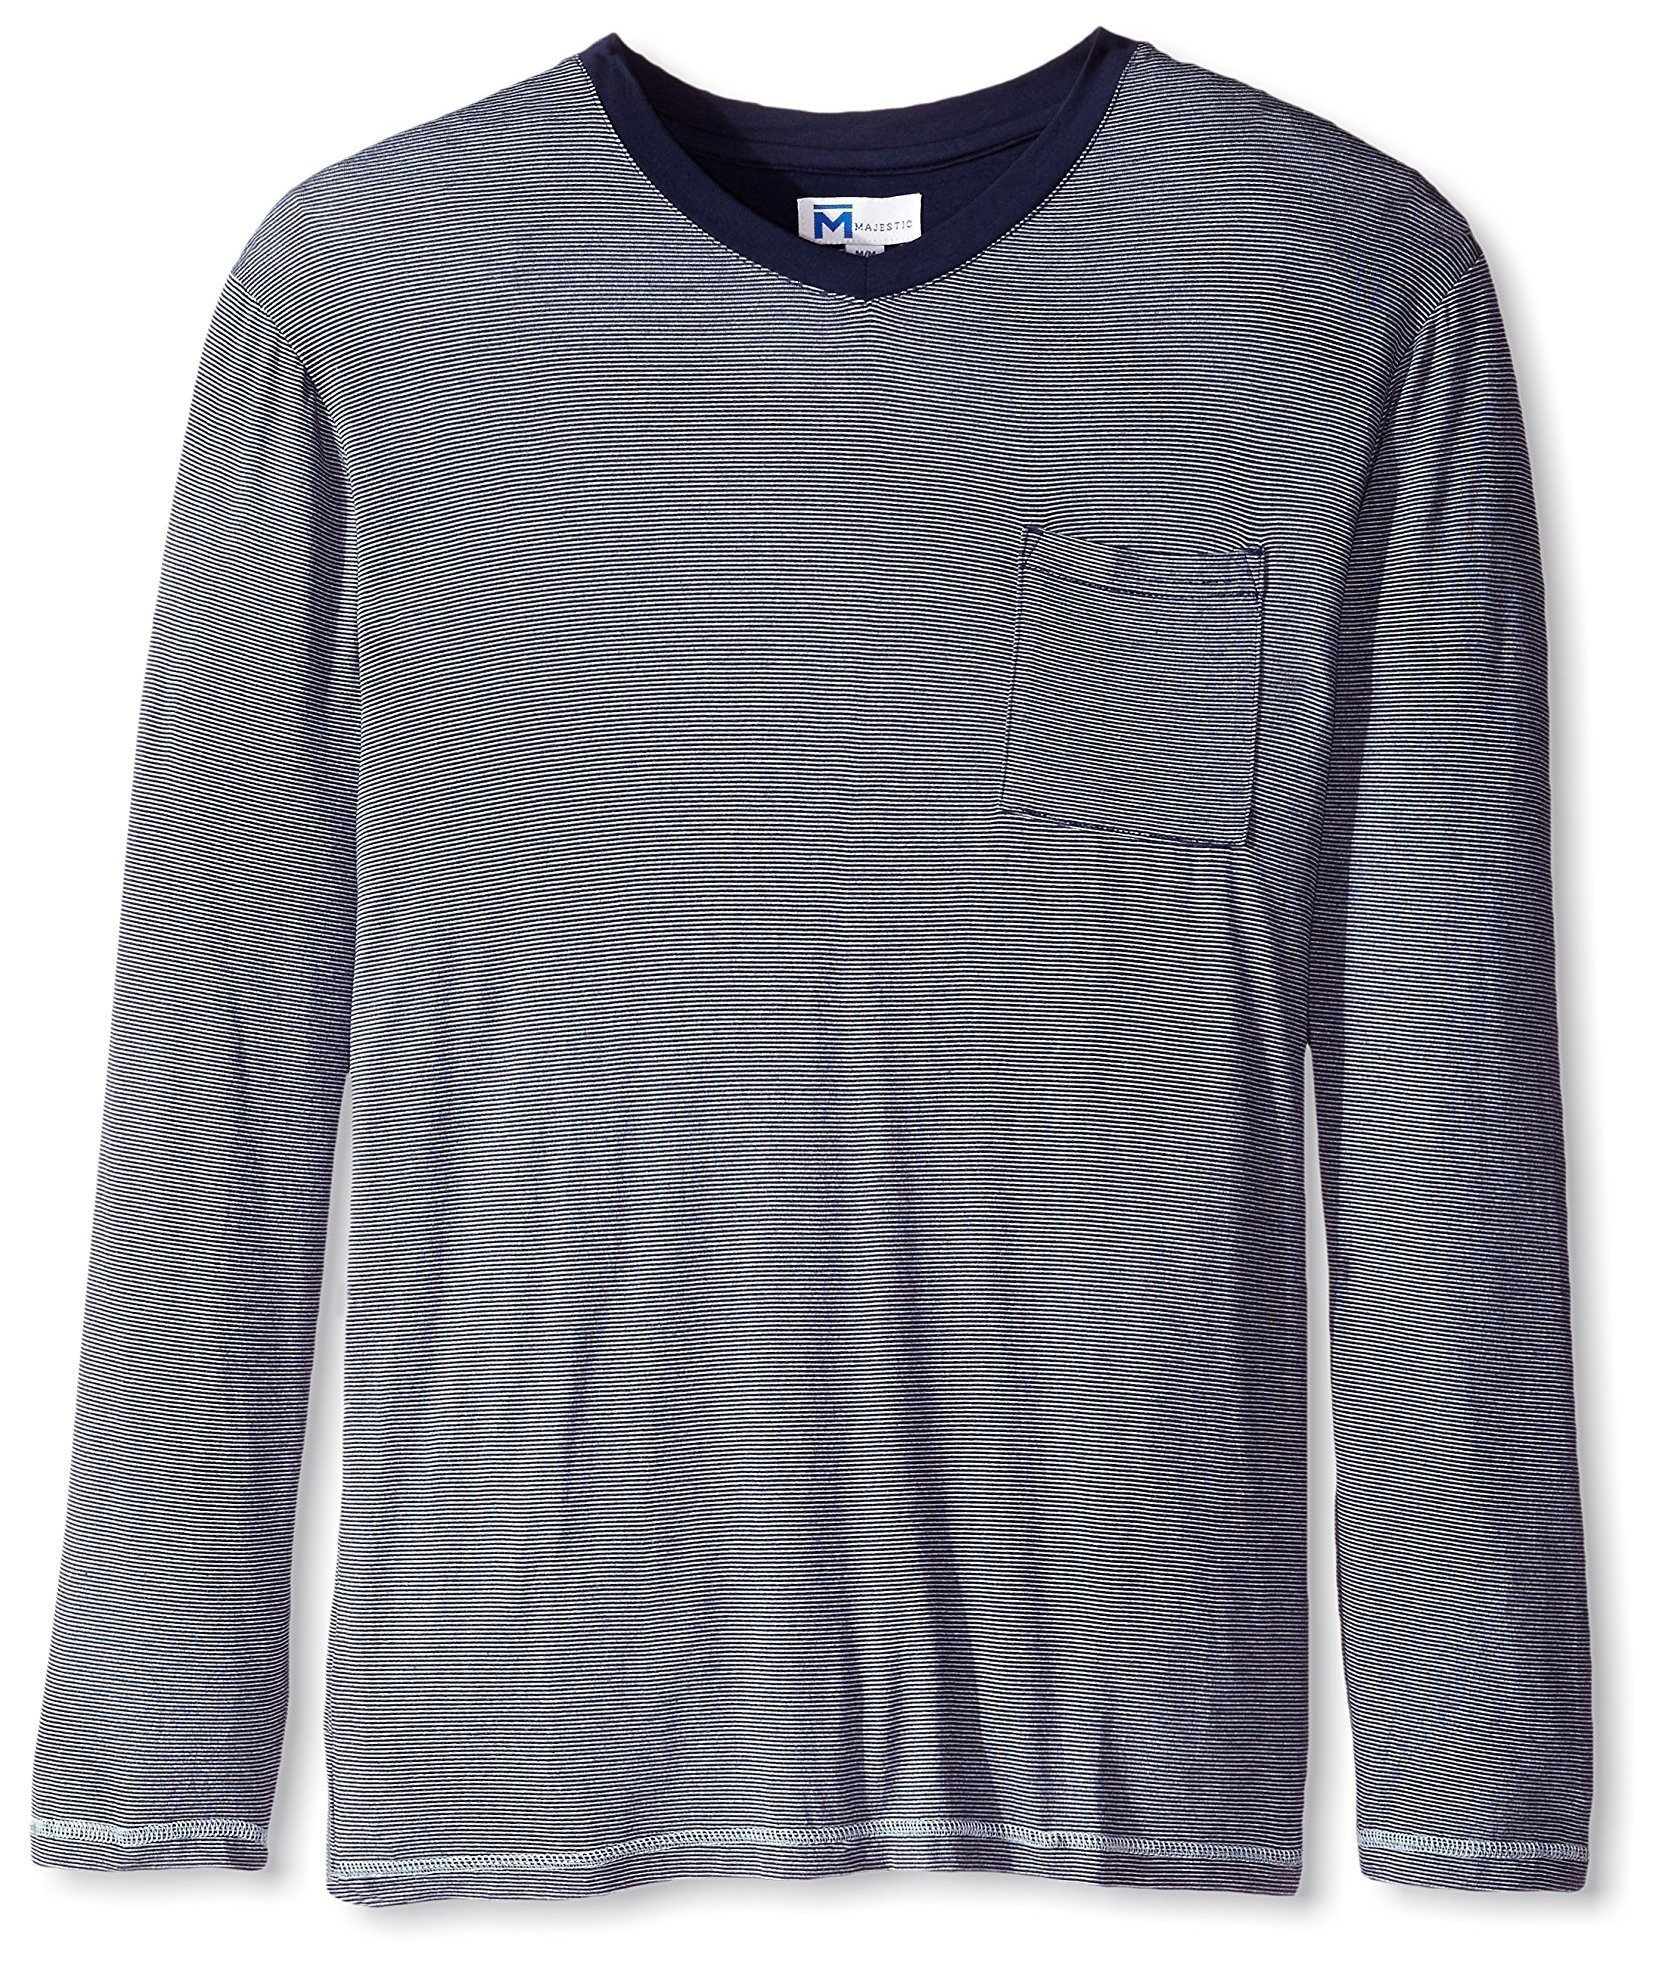 Majestic International Men's Modal Knit Fine Line Long Sleeve Top, Navy Stripe, L